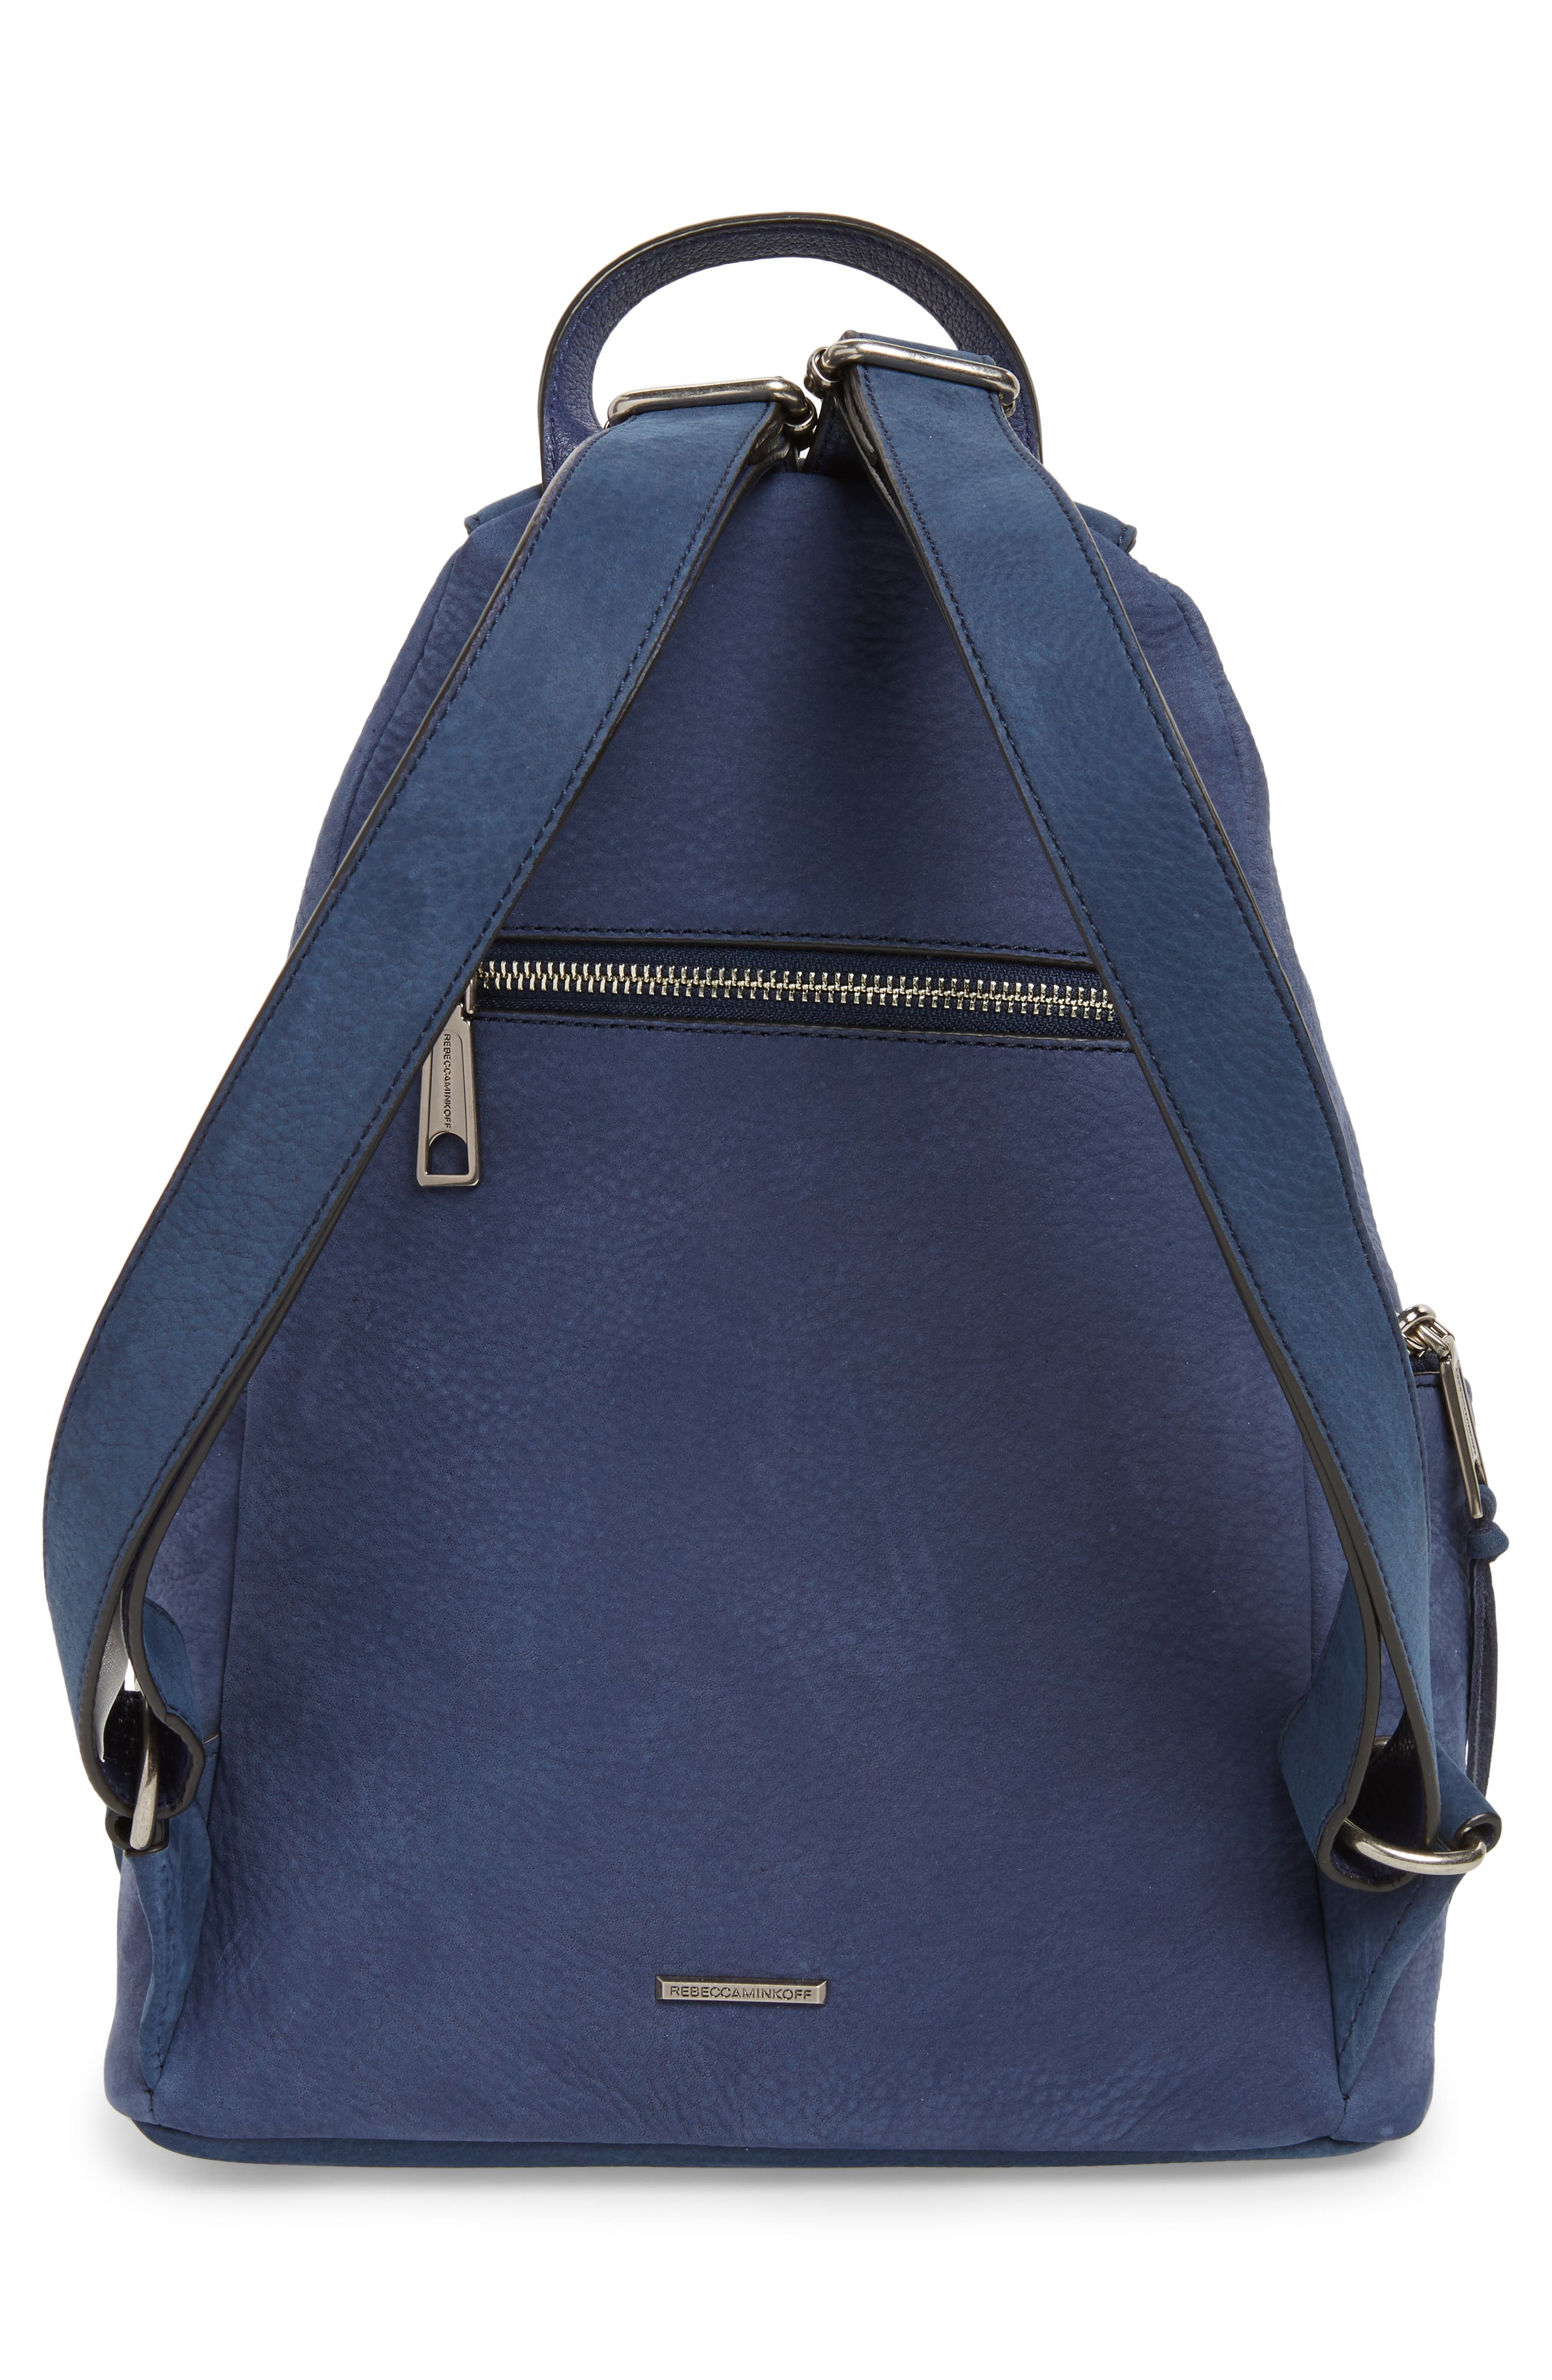 Julian Convertible Nubuck Leather Backpack,                             Alternate thumbnail 3, color,                             True Navy